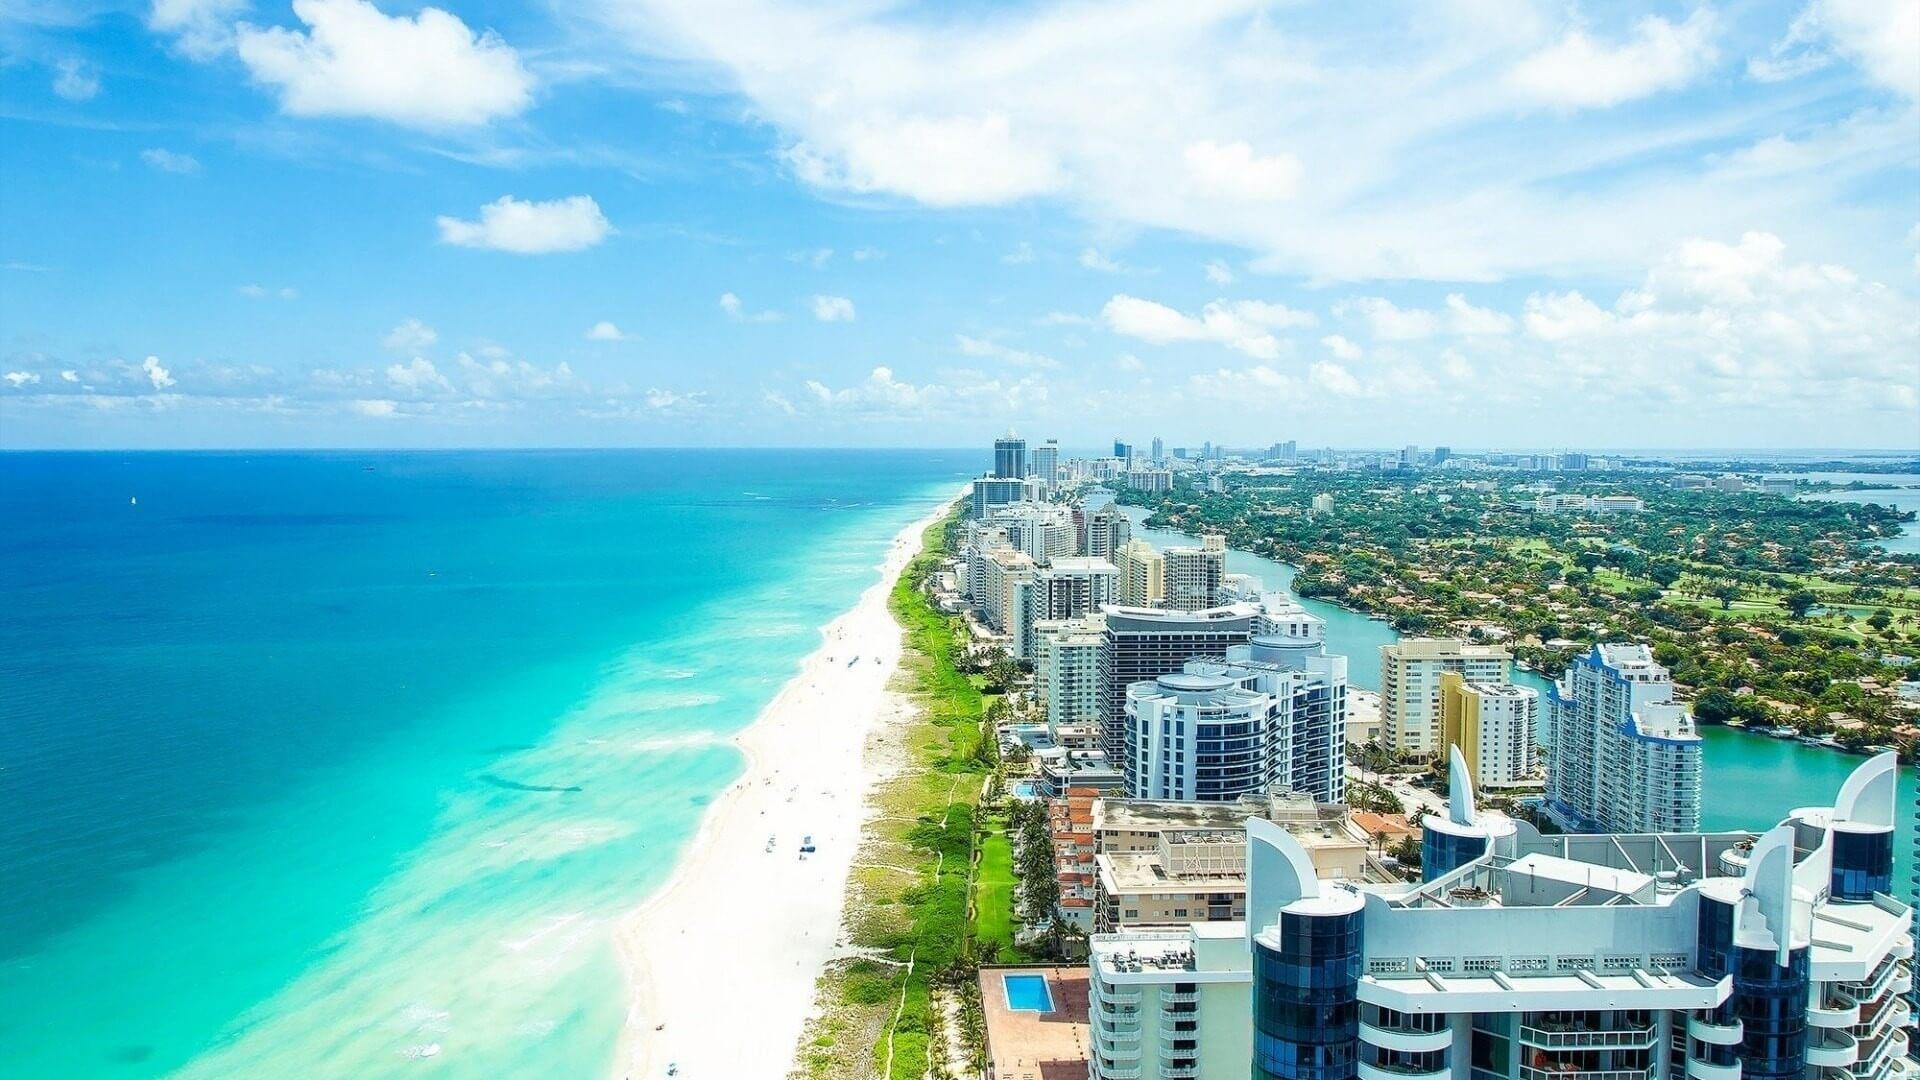 New York to Miami Private Jet Flights